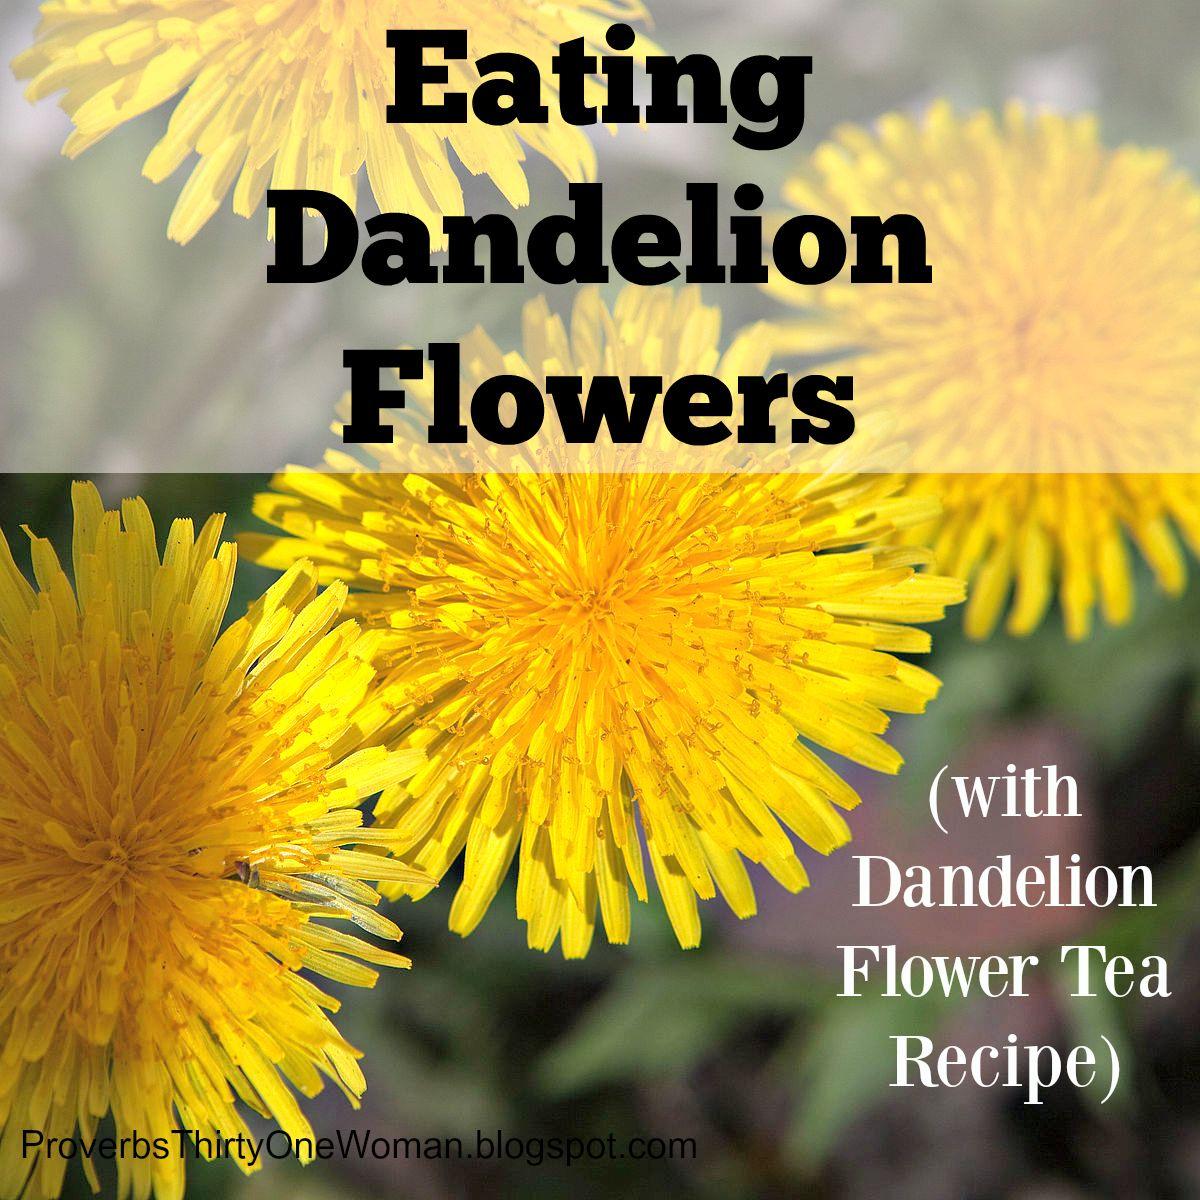 Eating Dandelion Flowers Dandelion Flower Tea Recipe Proverbs 31 Woman Eating Dandelions Flower Tea Dandelion Flower